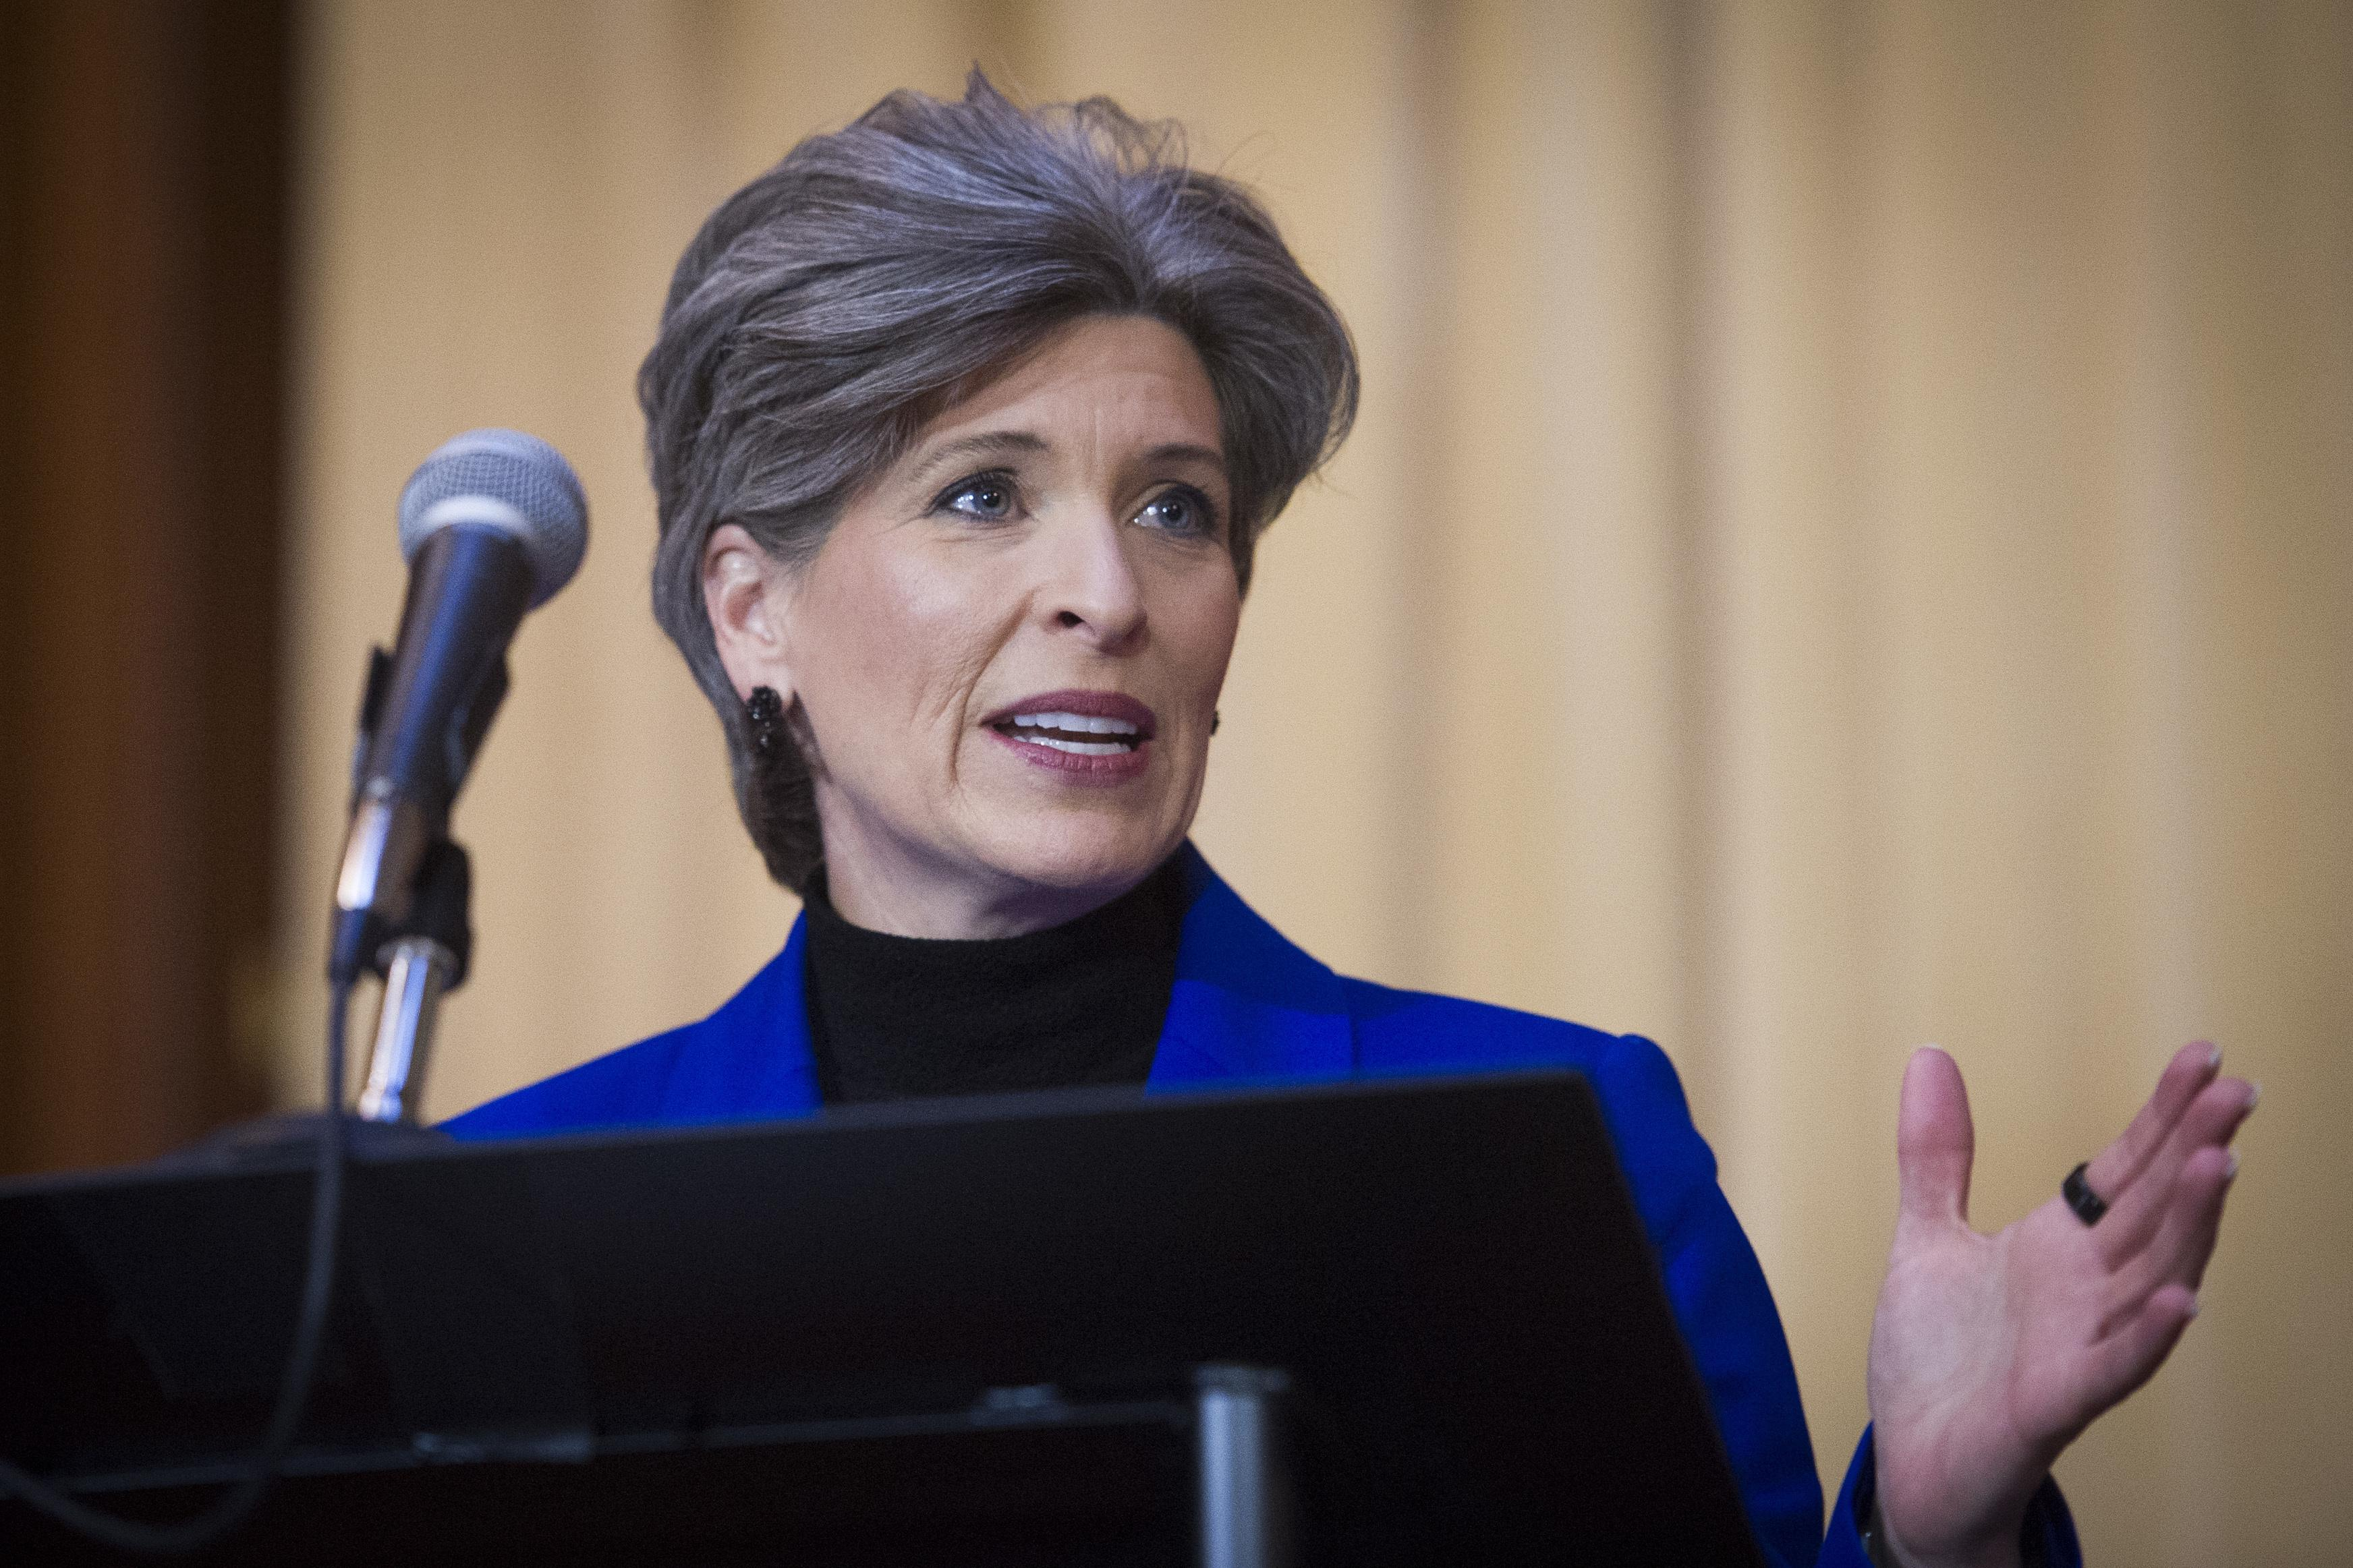 Sens. Ernst, Romney call for investigation into Trump rape accusation